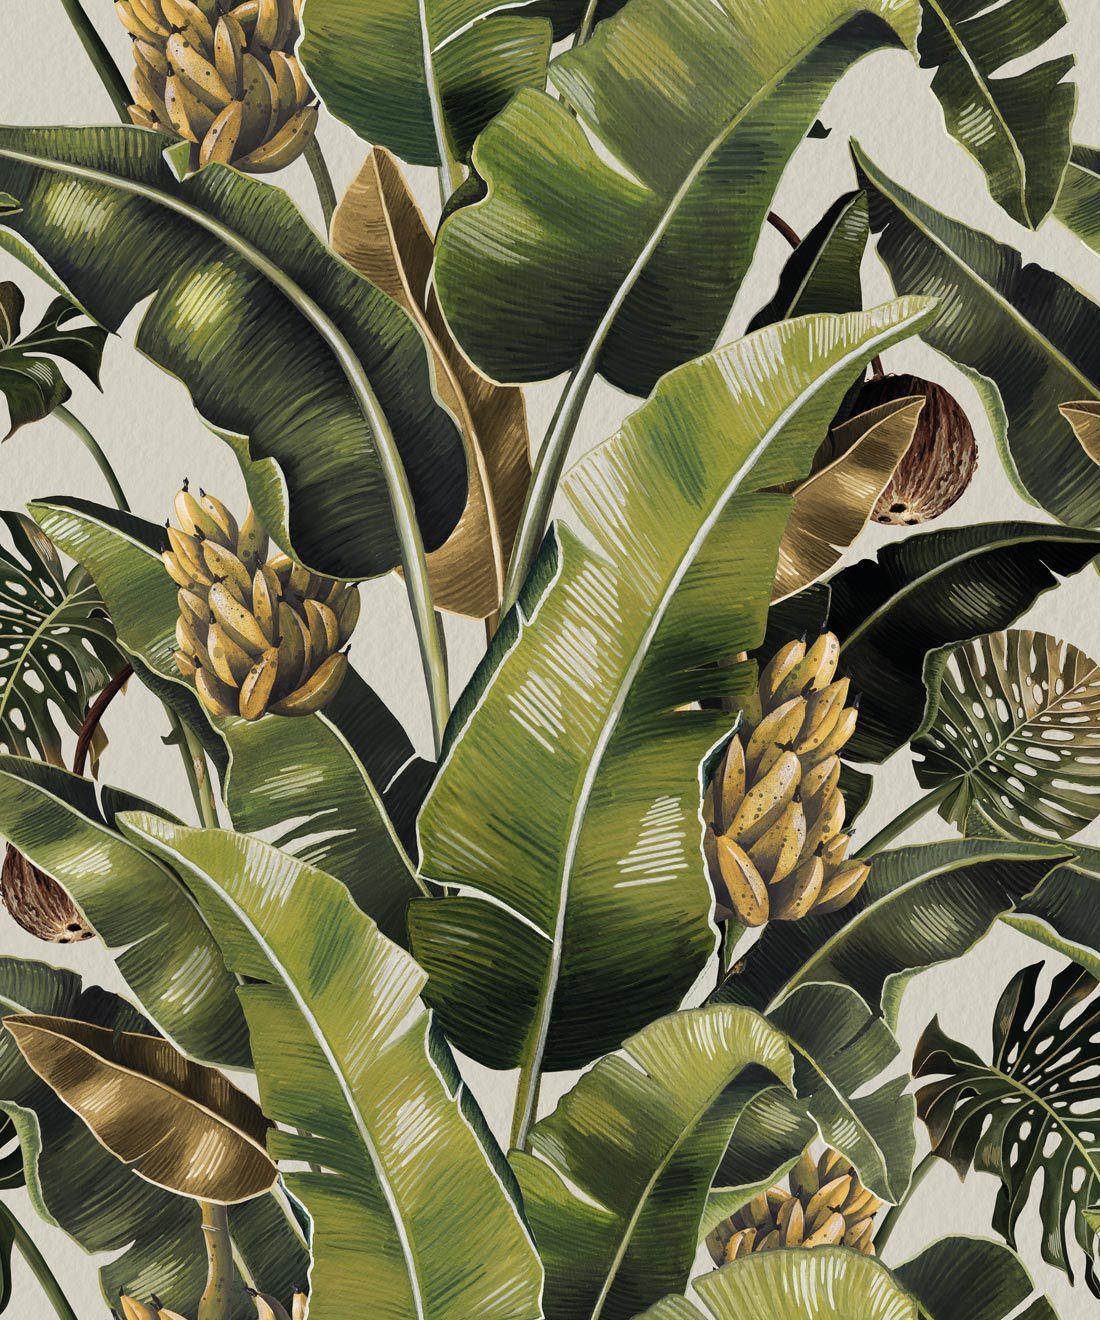 Kingdom Palm Wallpaper (Two Roll Set)